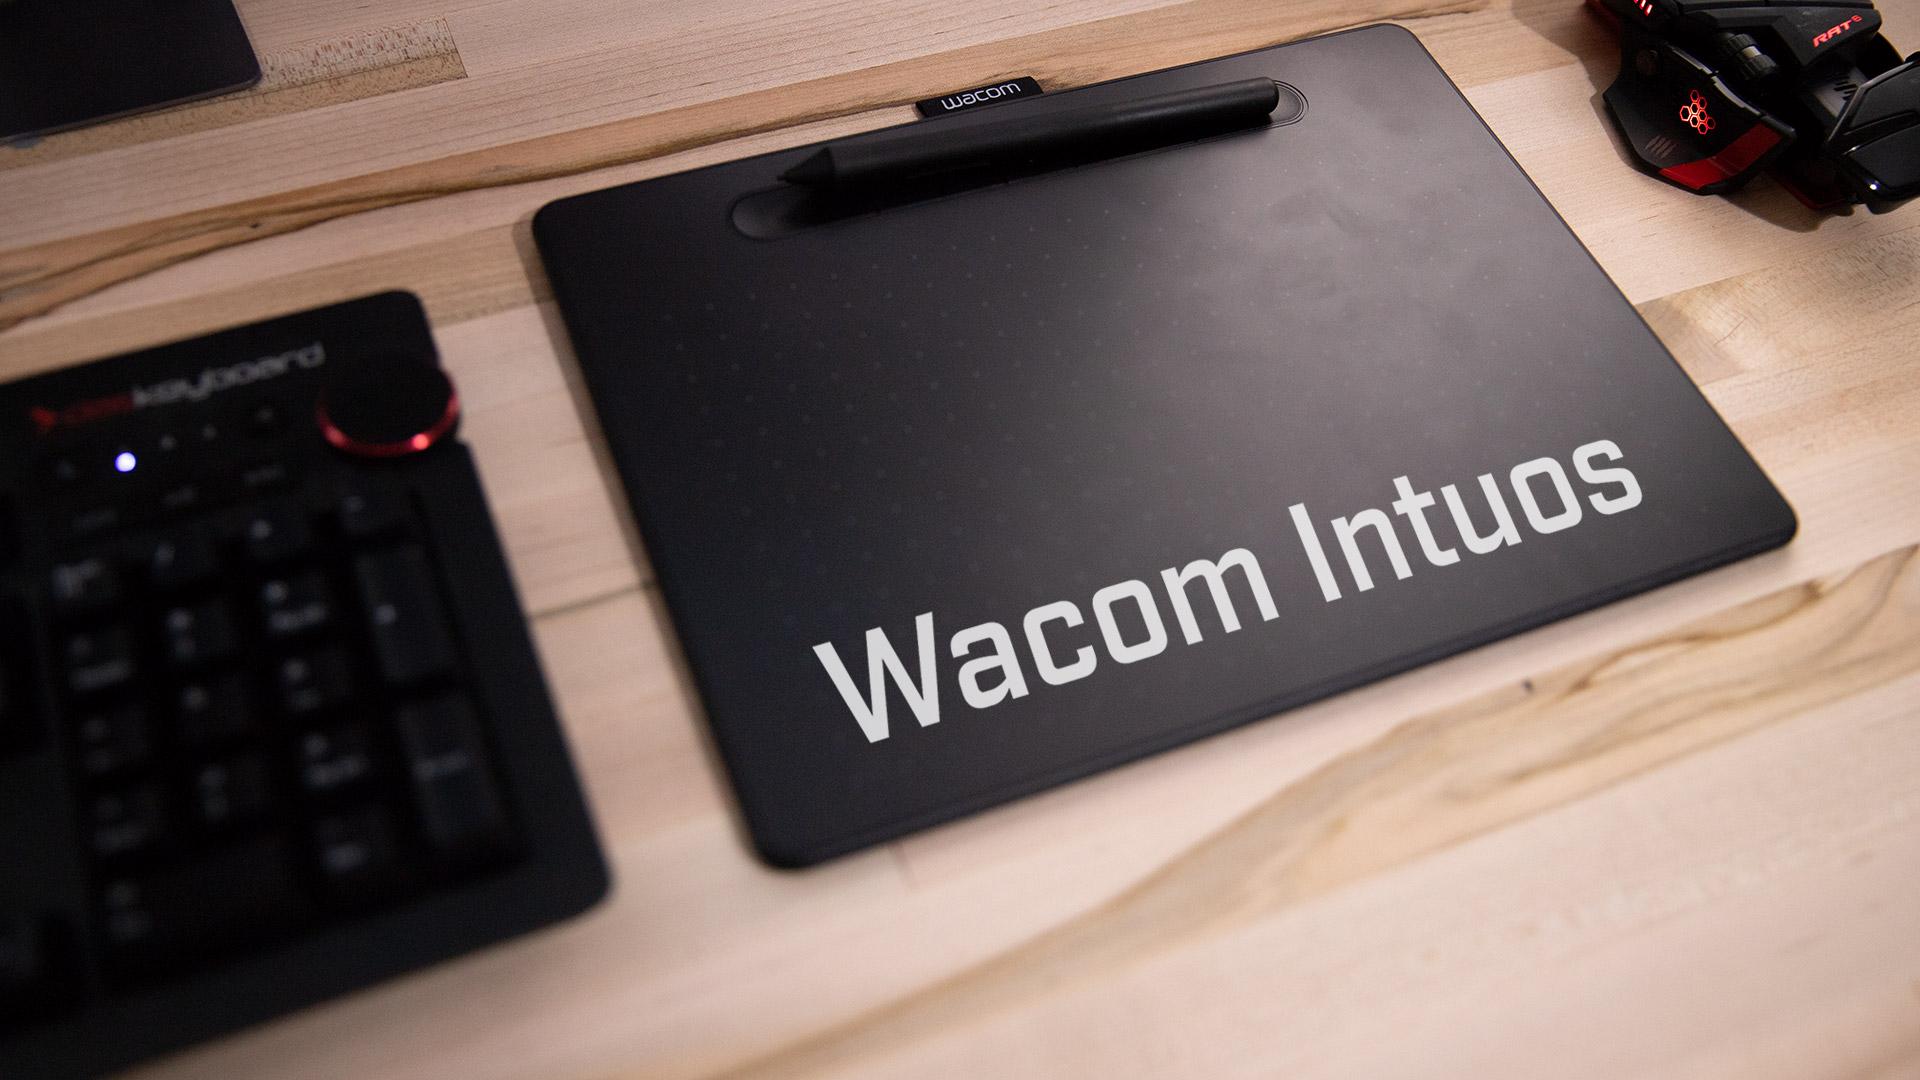 Wacom Intuos Trading Review